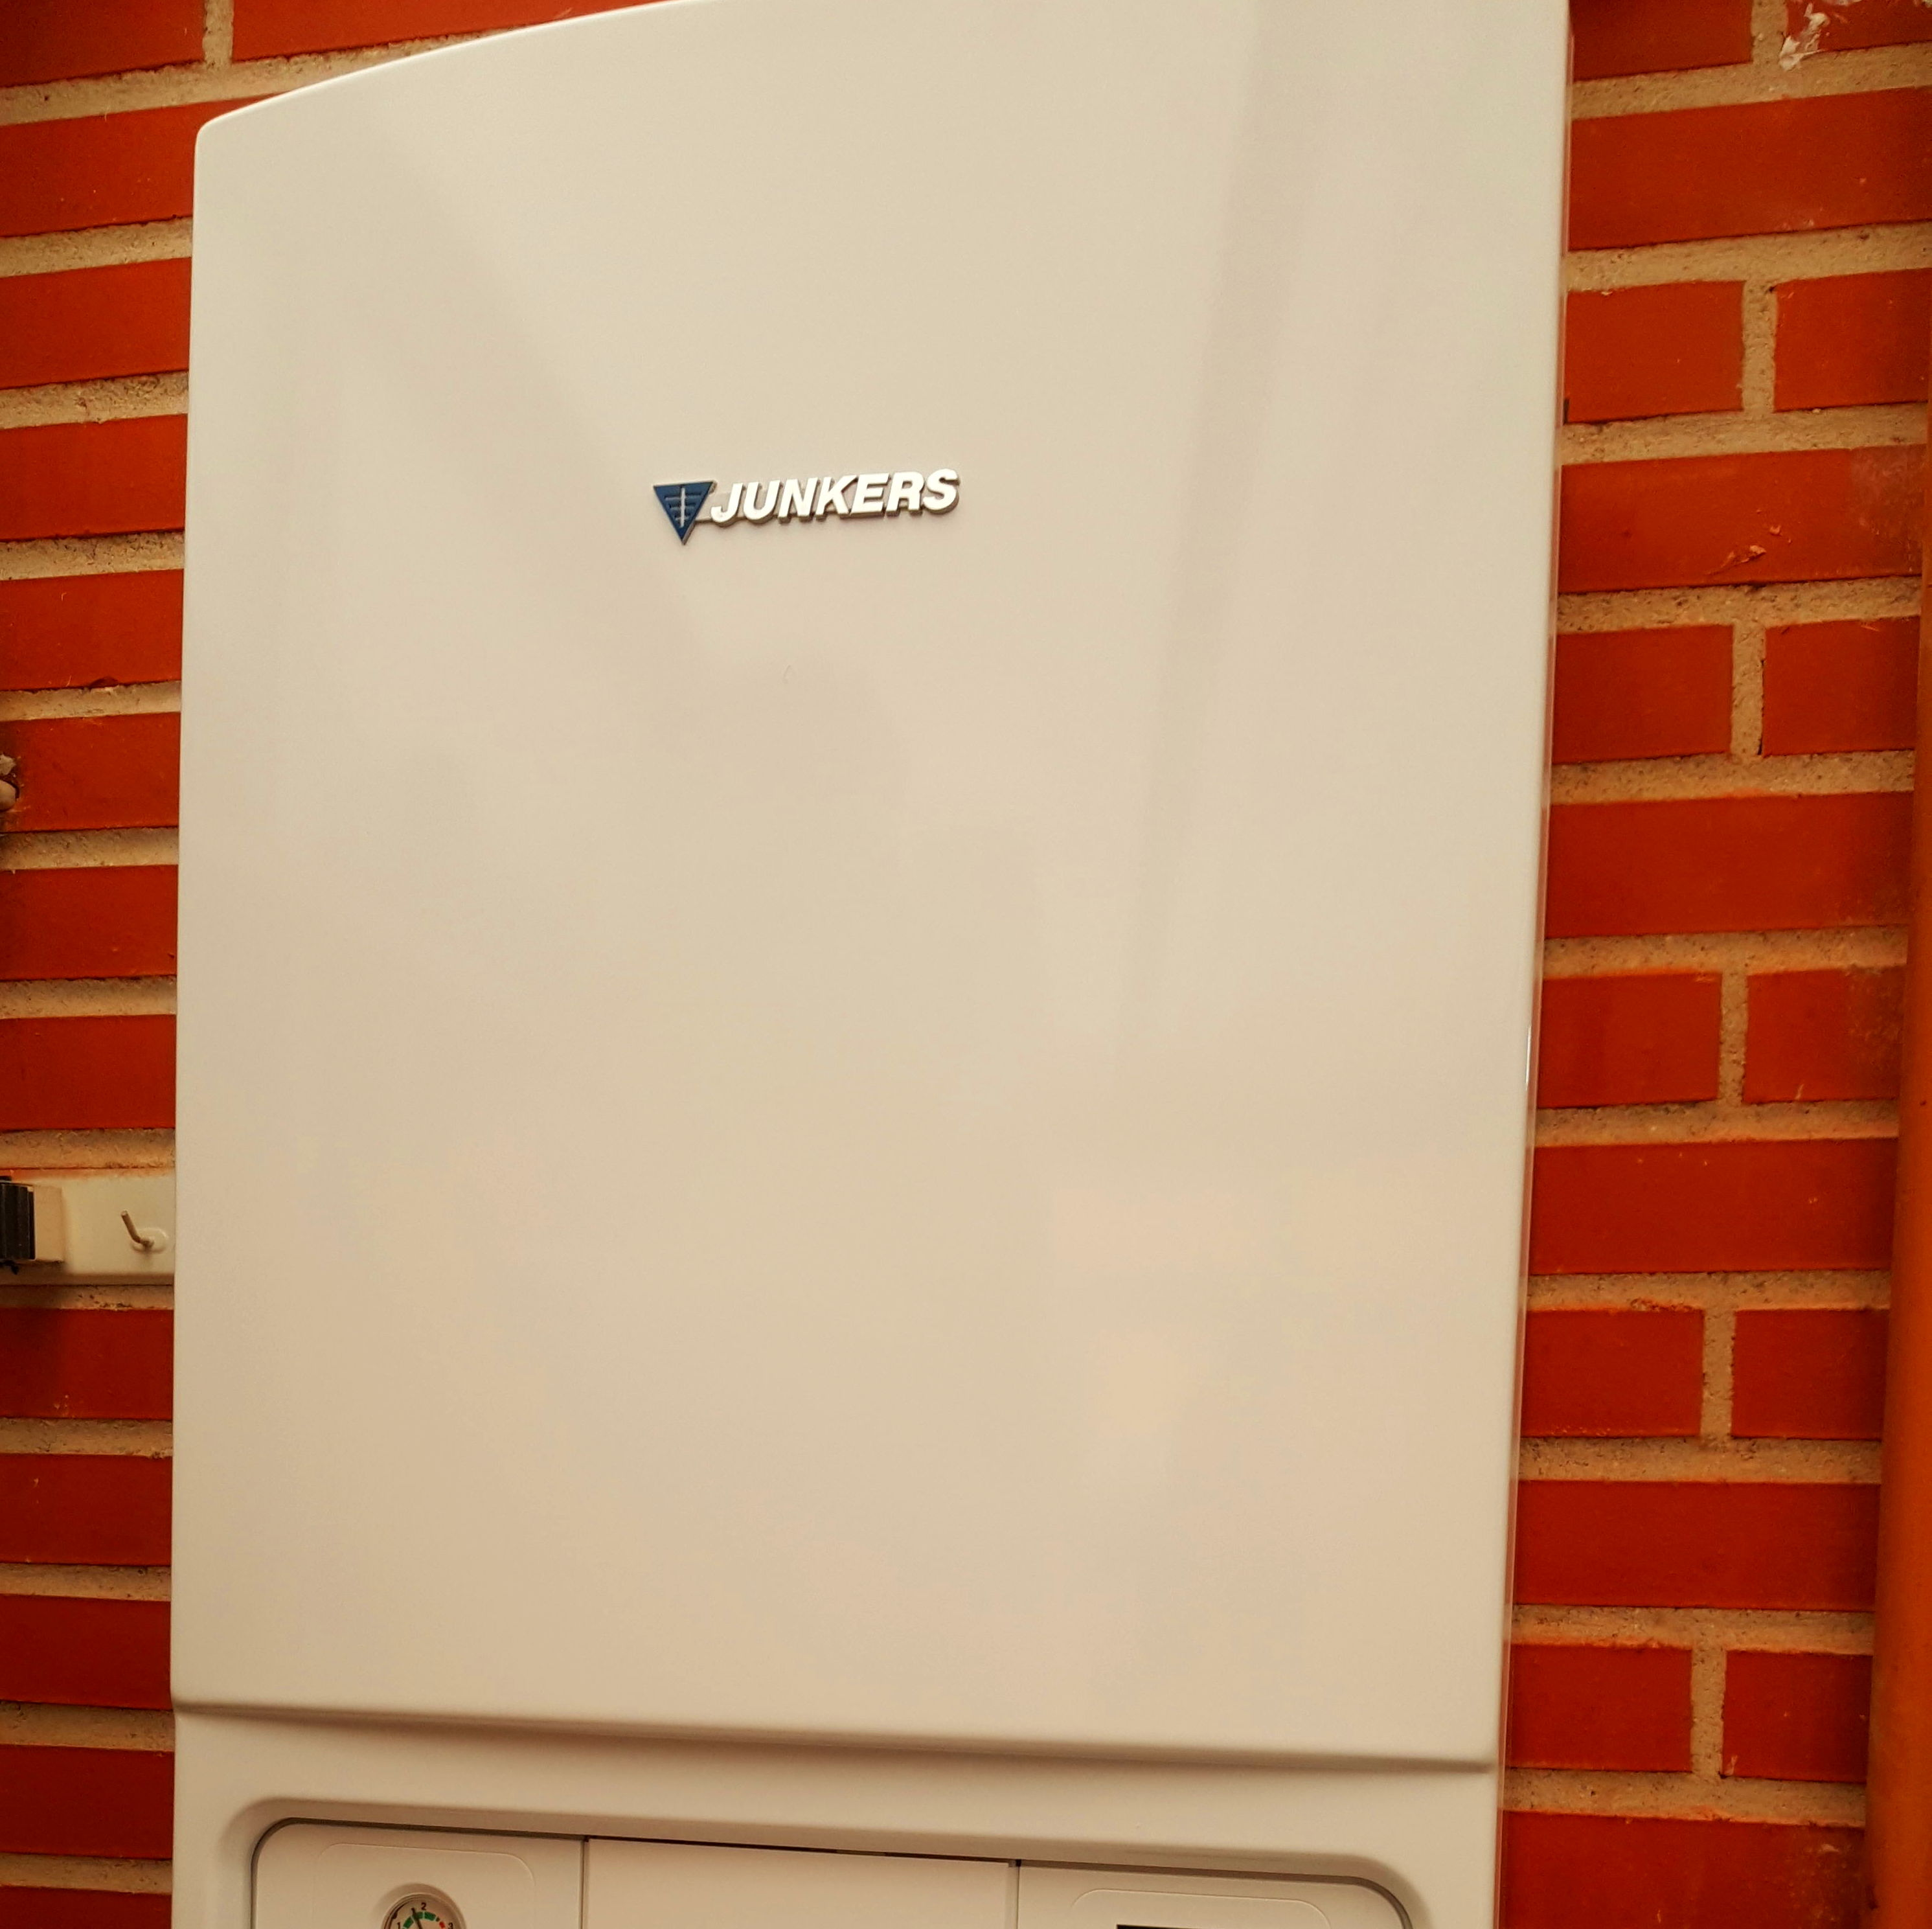 Instaladores de calderas for Instaladores de calderas de gas